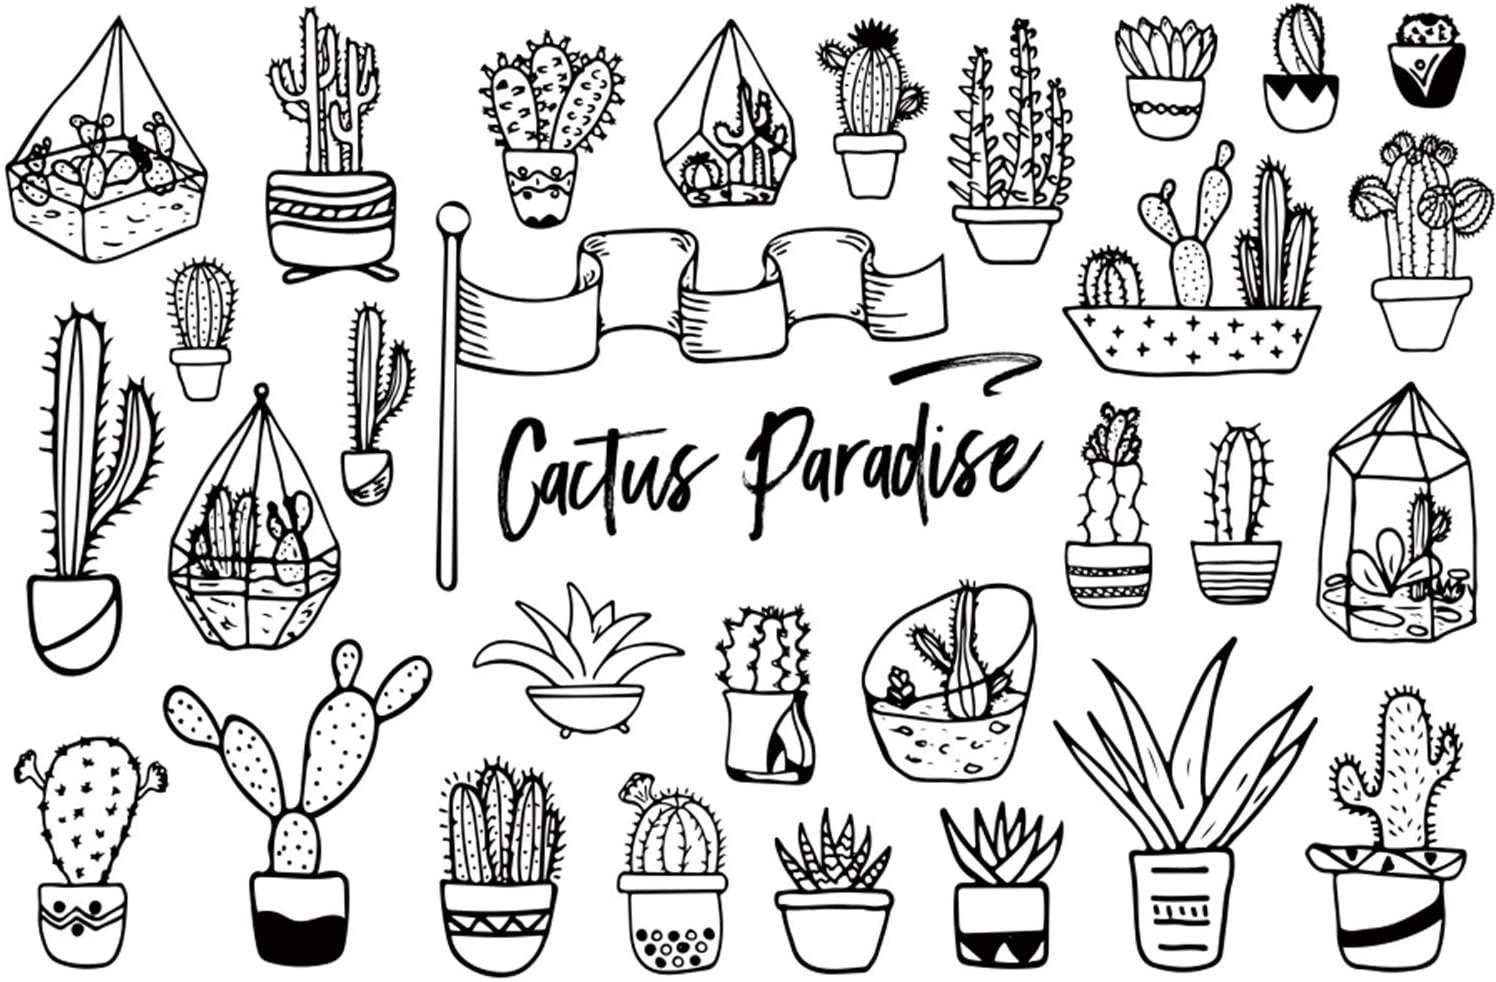 Leowefowa Cactus Paradise Doodles Backdrop 10x8ft Vinyl Different Cactus Pot Plants Freehand Sketch Illustrations Photography Background Event Party Activities Art Exhibition Photo Booth Poster